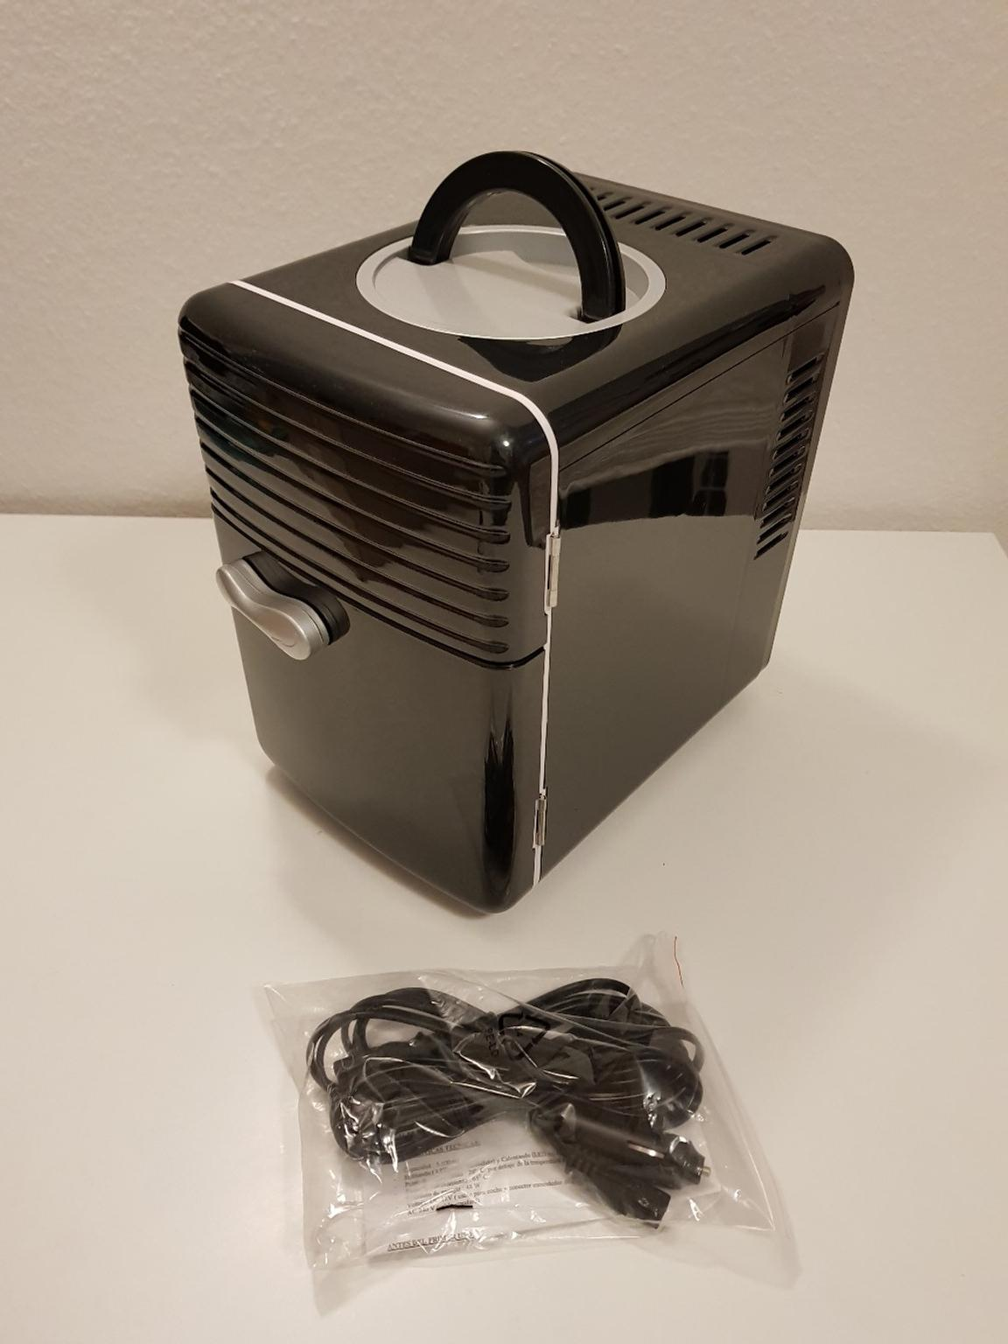 Mini Kühlschrank Mit Wärmefunktion : Gebraucht neuer mc cool mobiler mini kühlschrank in eberbach